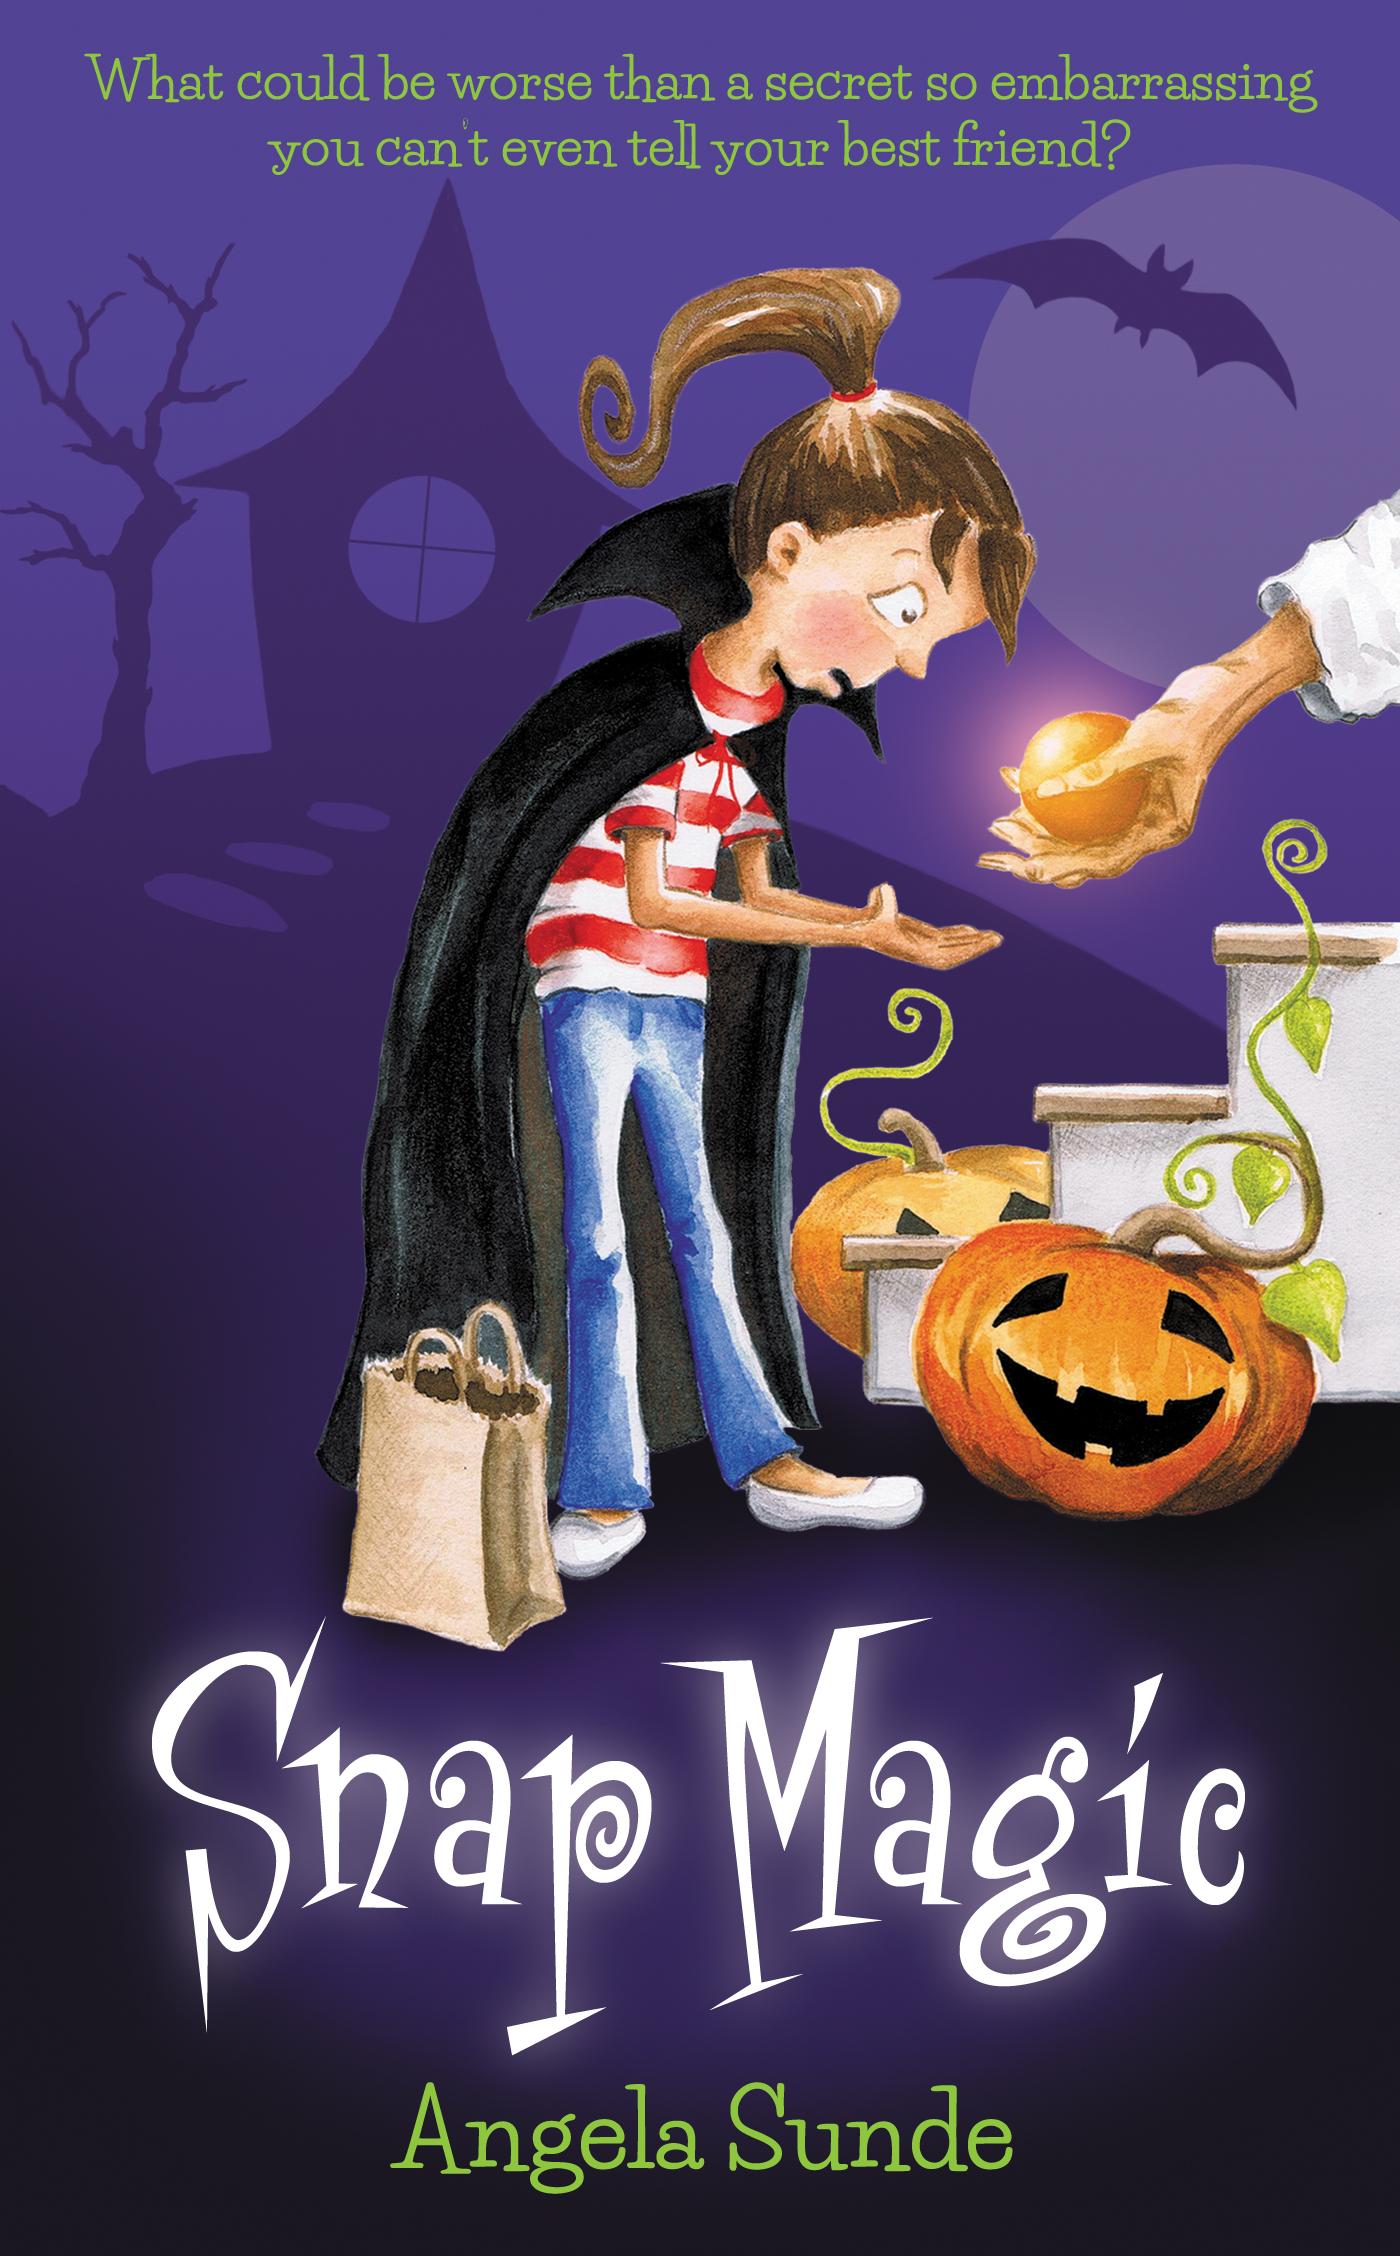 Children S Book Cover Ideas ~ Cover designs children s samples book cafe